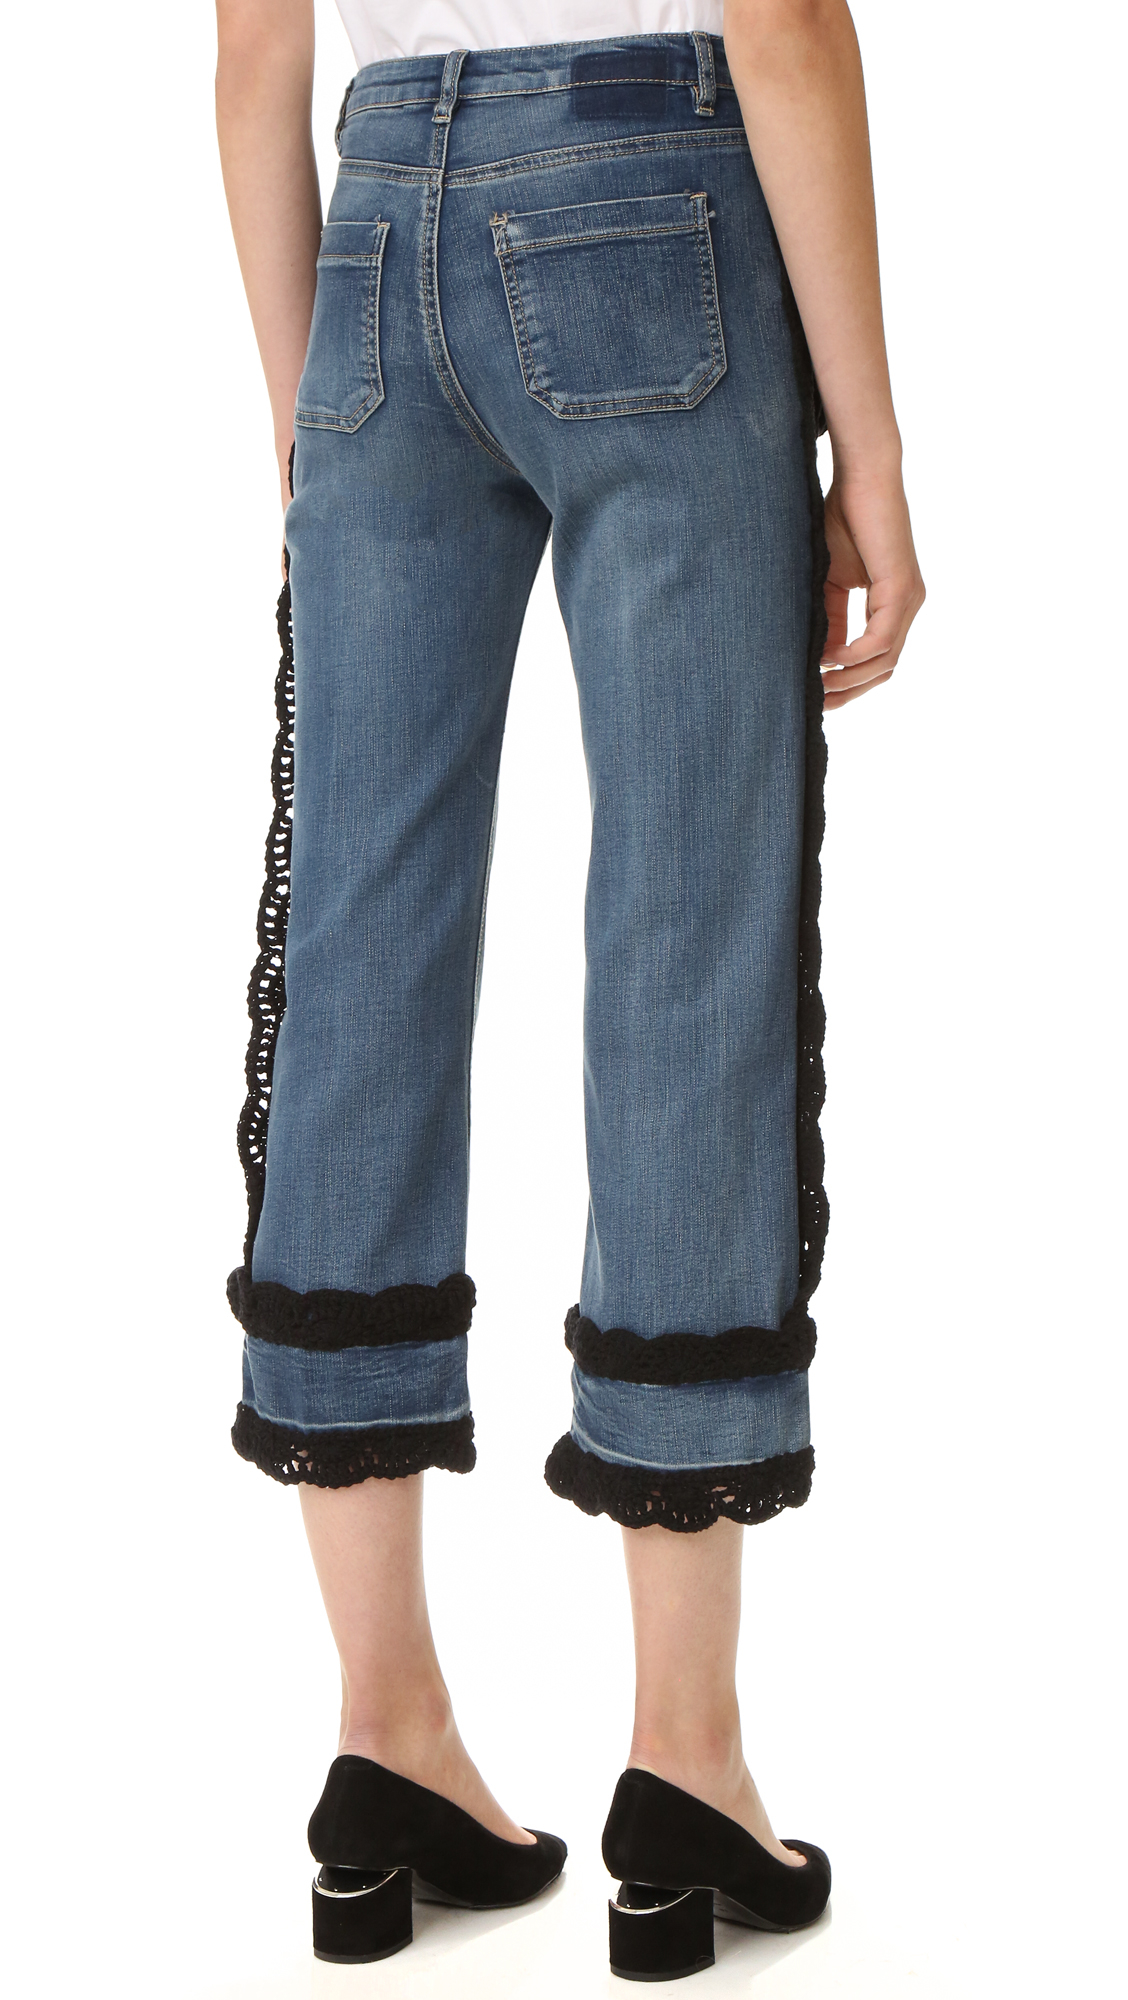 Michaela Buerger Denim Crochet Crop Jeans in Denim (Blue)